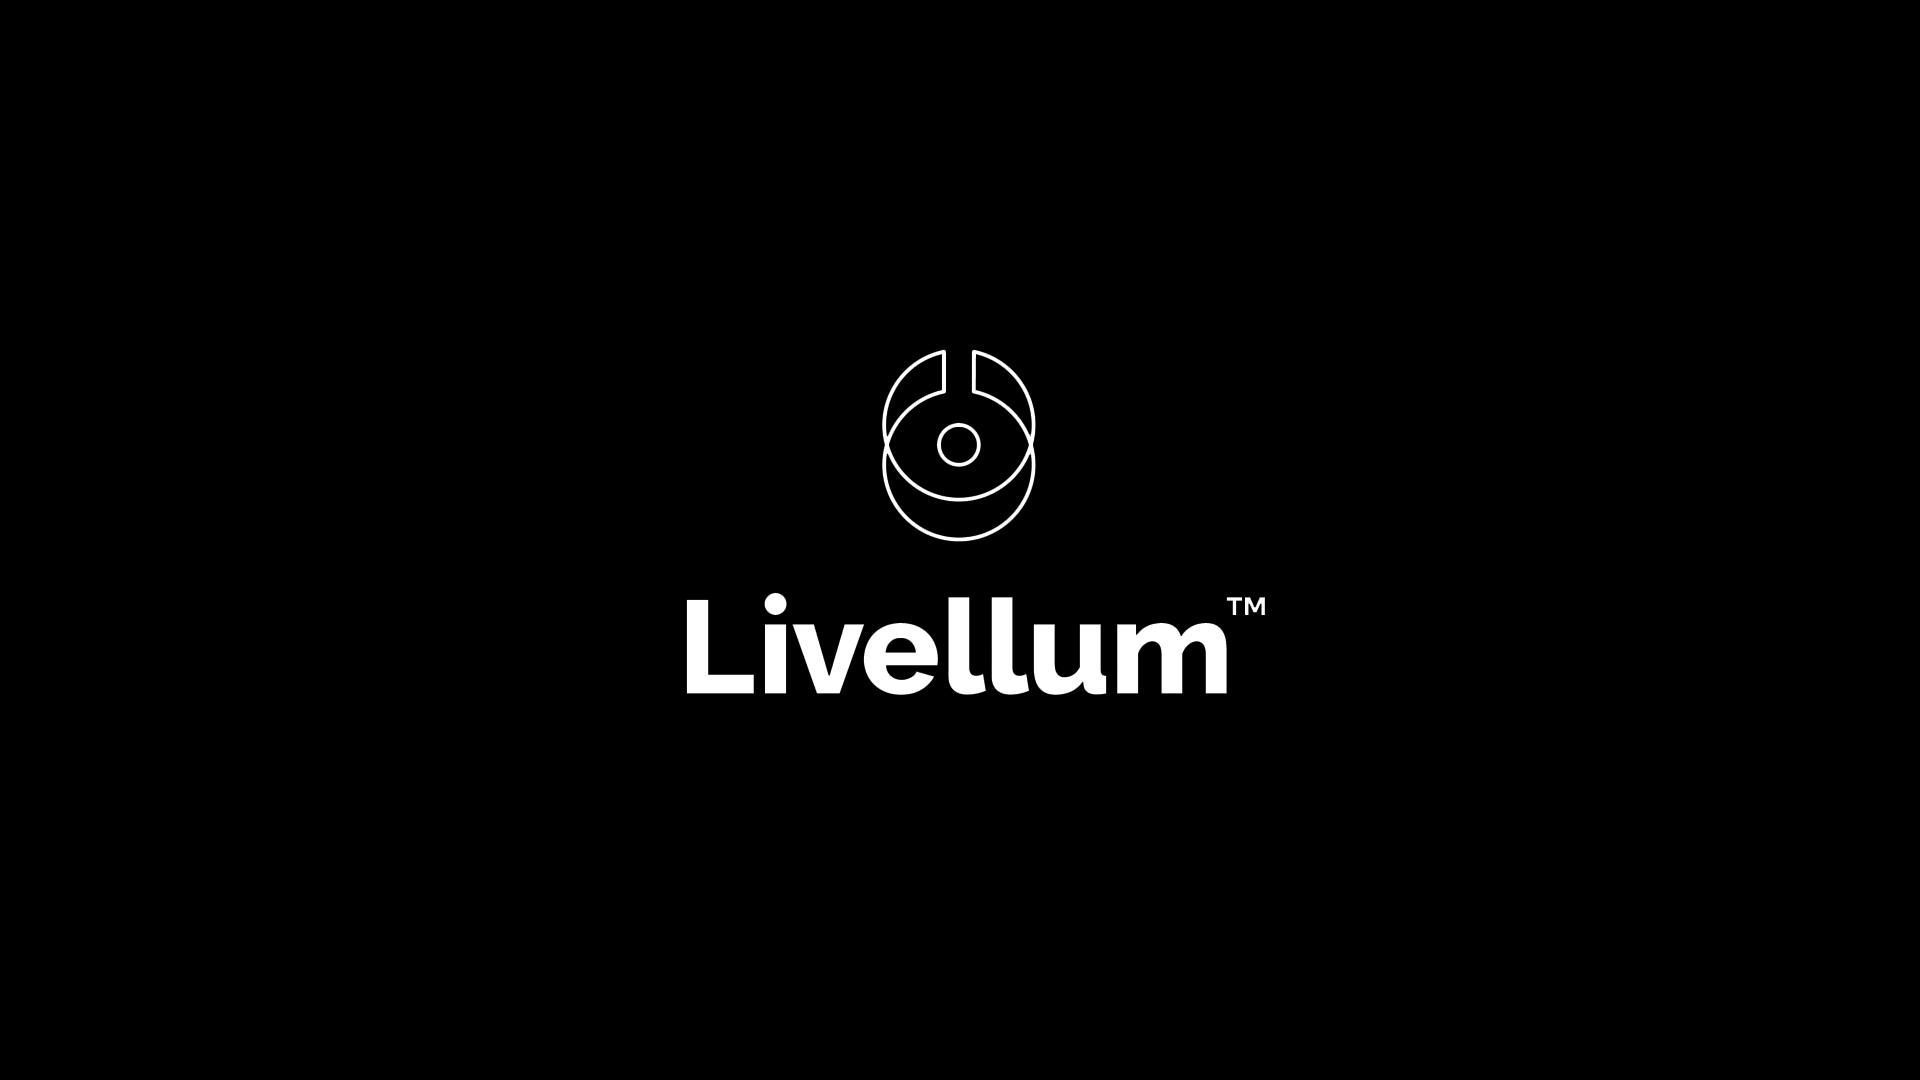 Livellum, brand identity